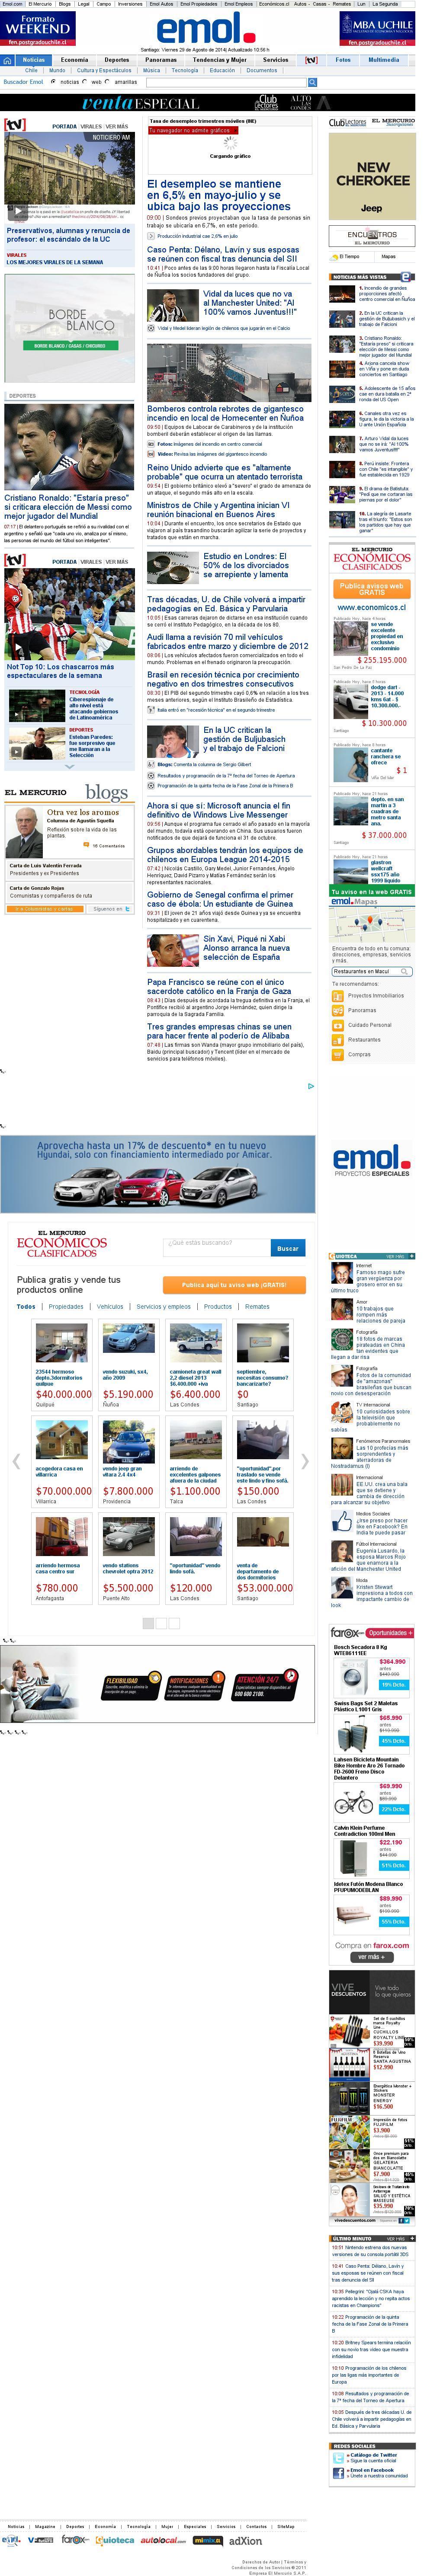 emol at Friday Aug. 29, 2014, 3:05 p.m. UTC